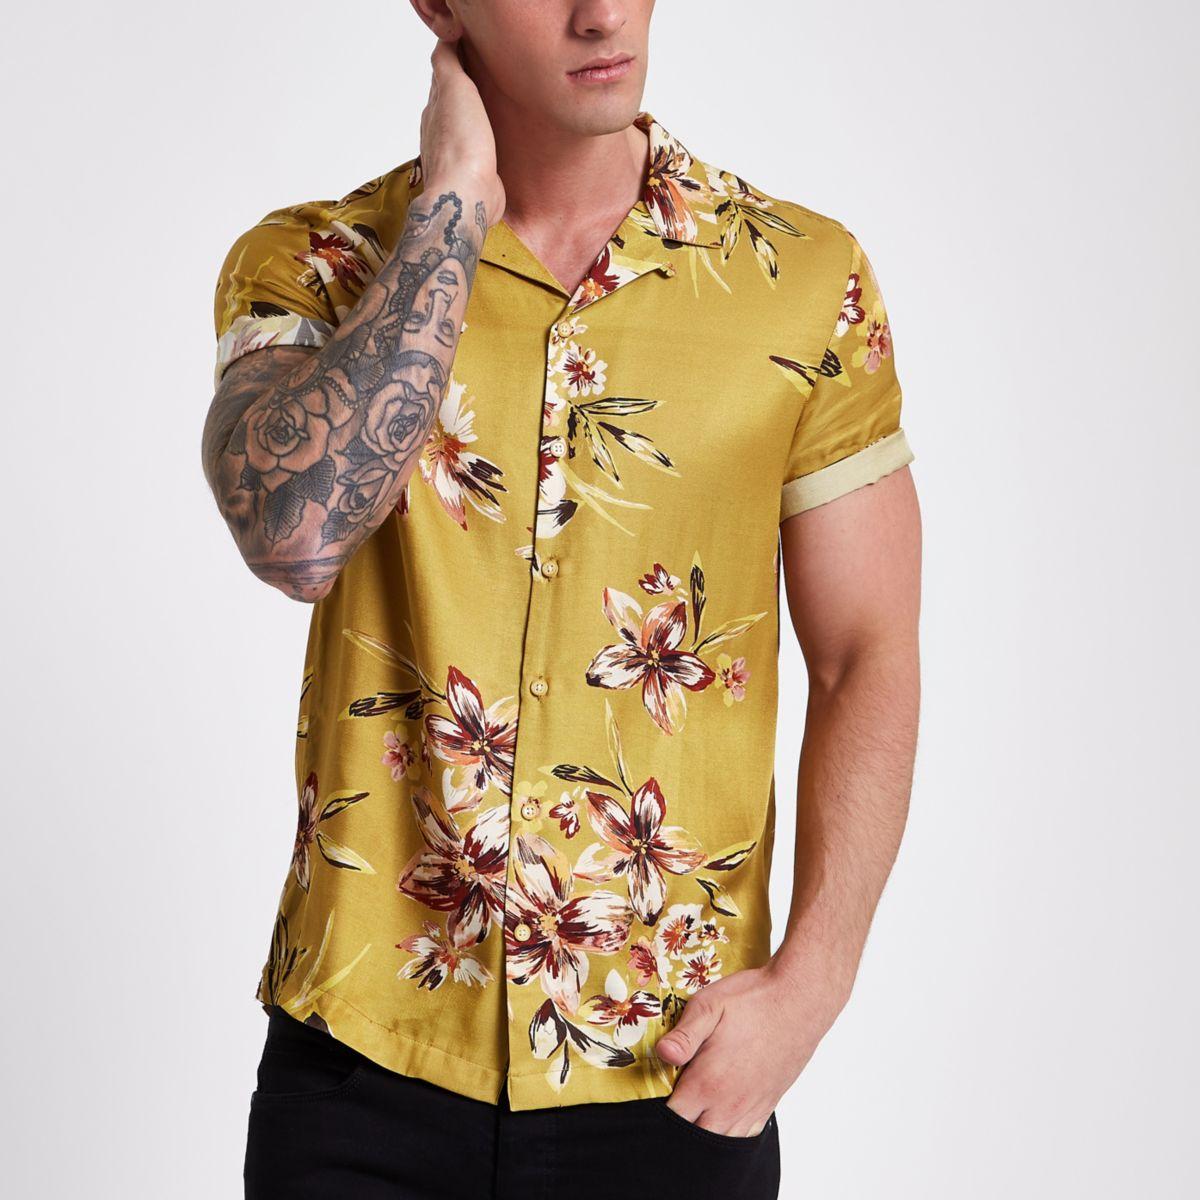 Mustard yellow floral short sleeve shirt